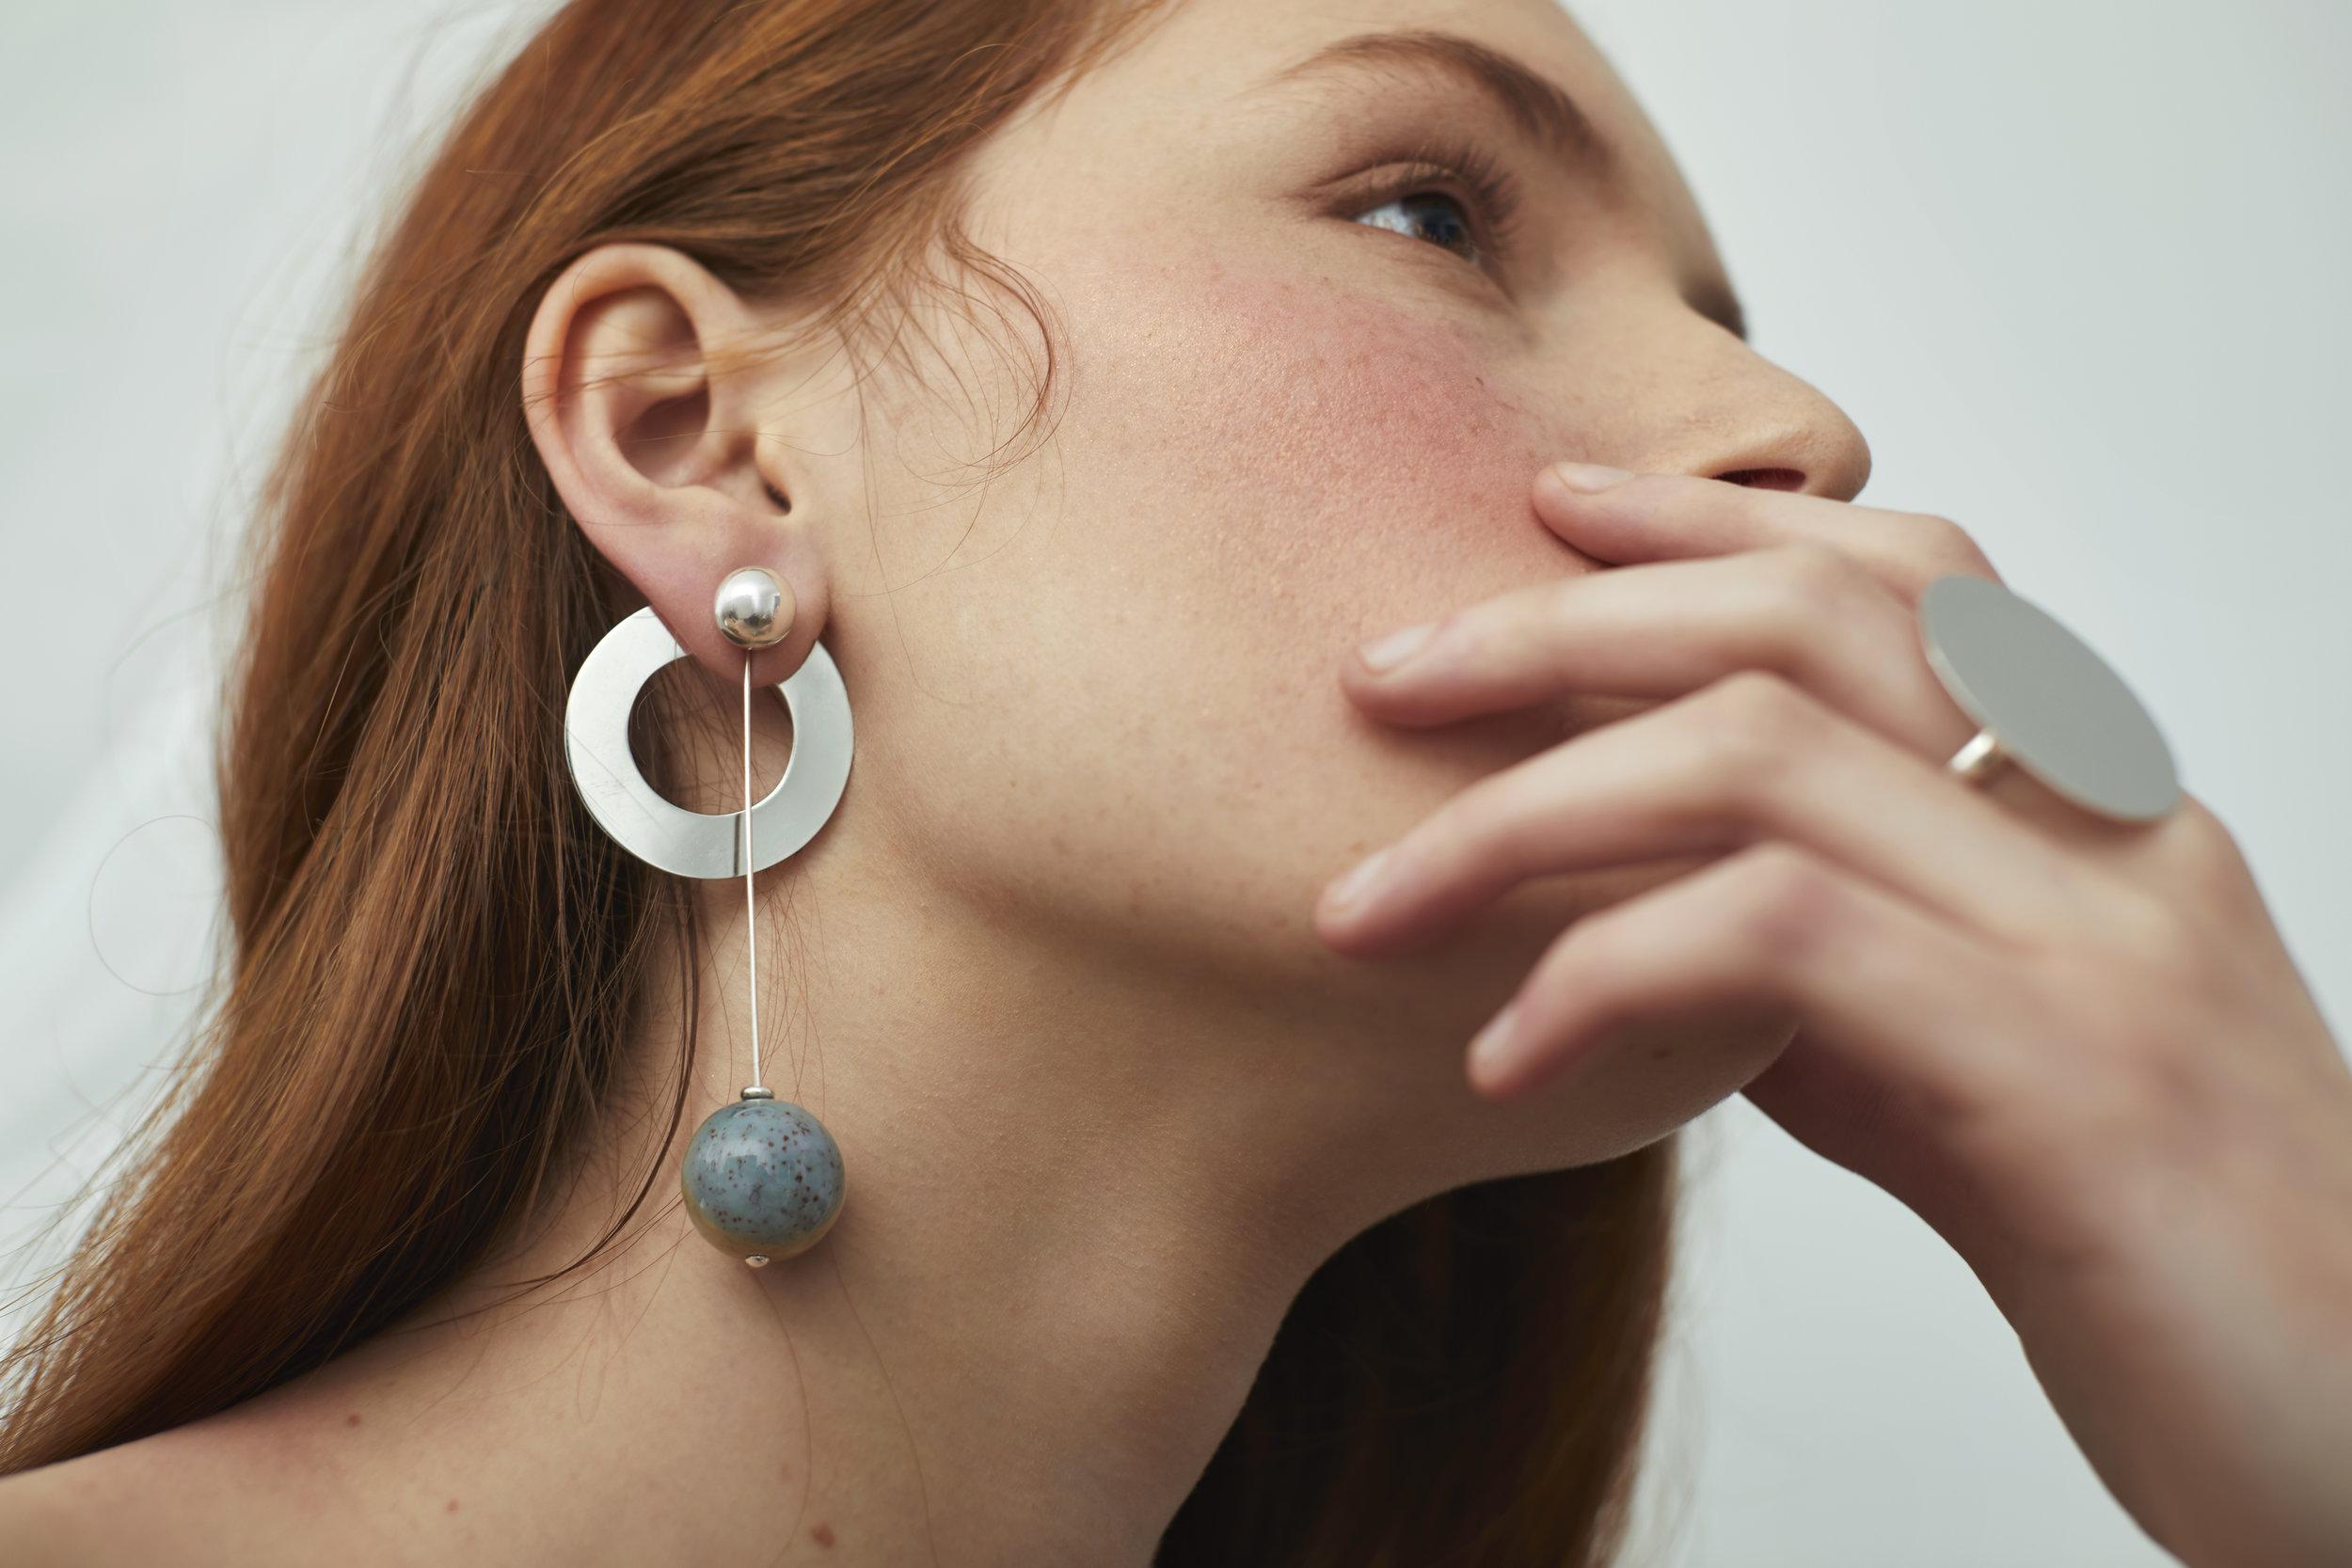 ▲ APHELION earring set, CONSONANCE ring